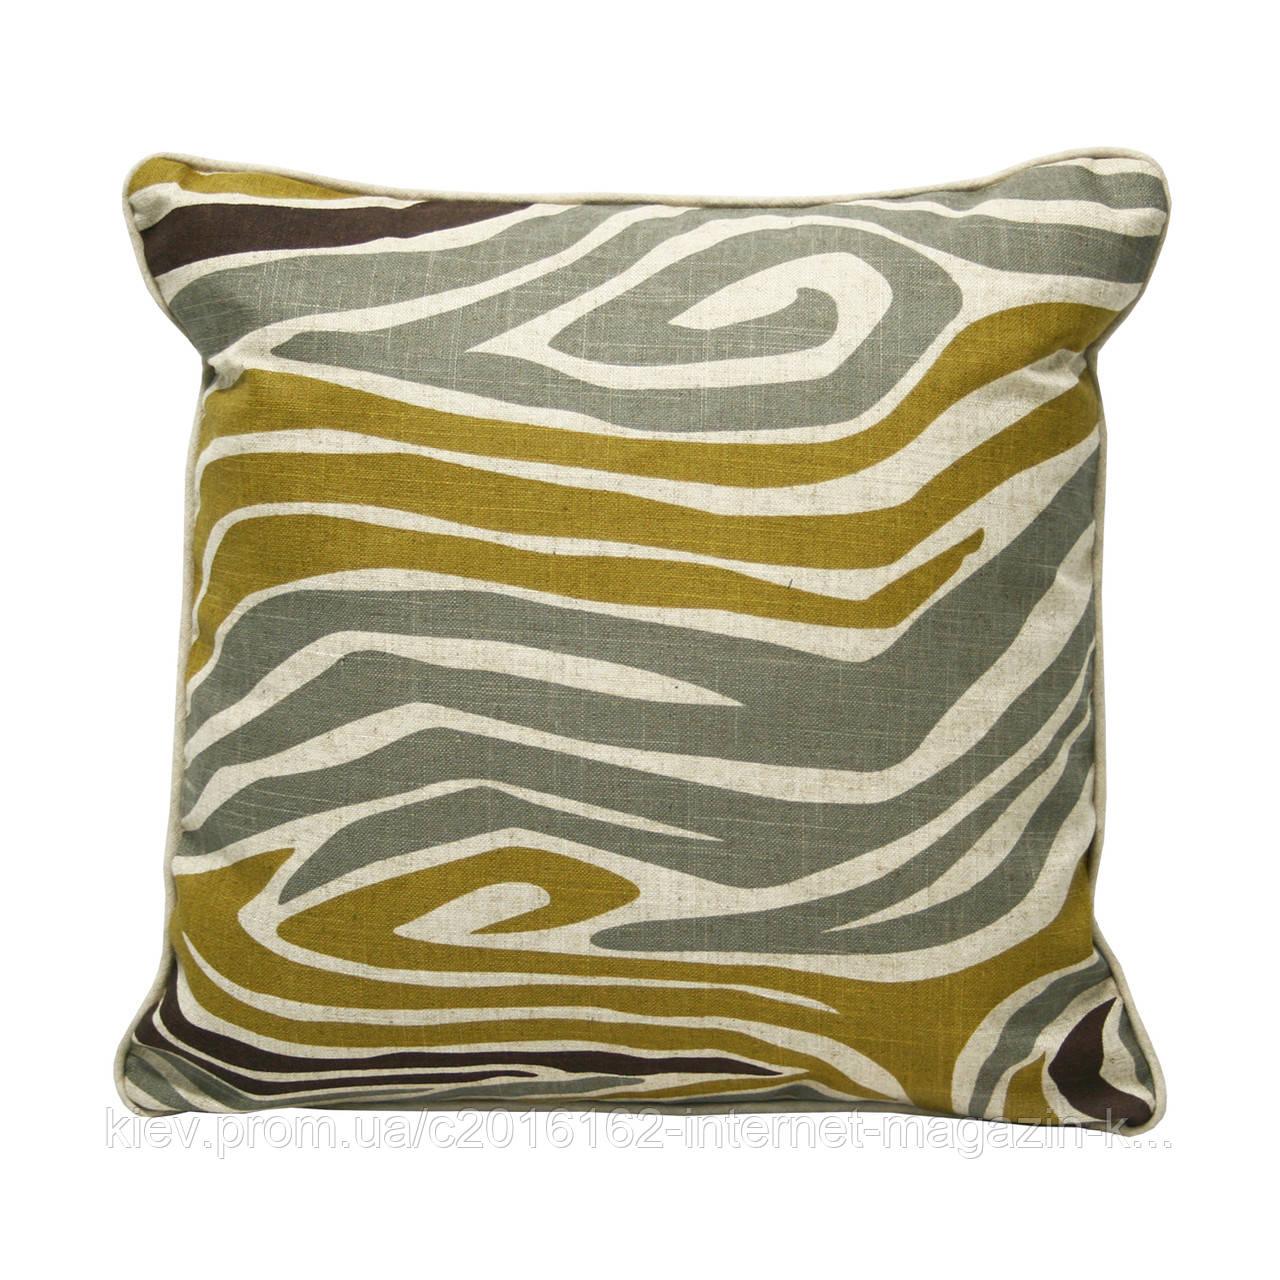 Подушка для дивана Home4You HOME  45x45cm  бежевая с африканским мотивом